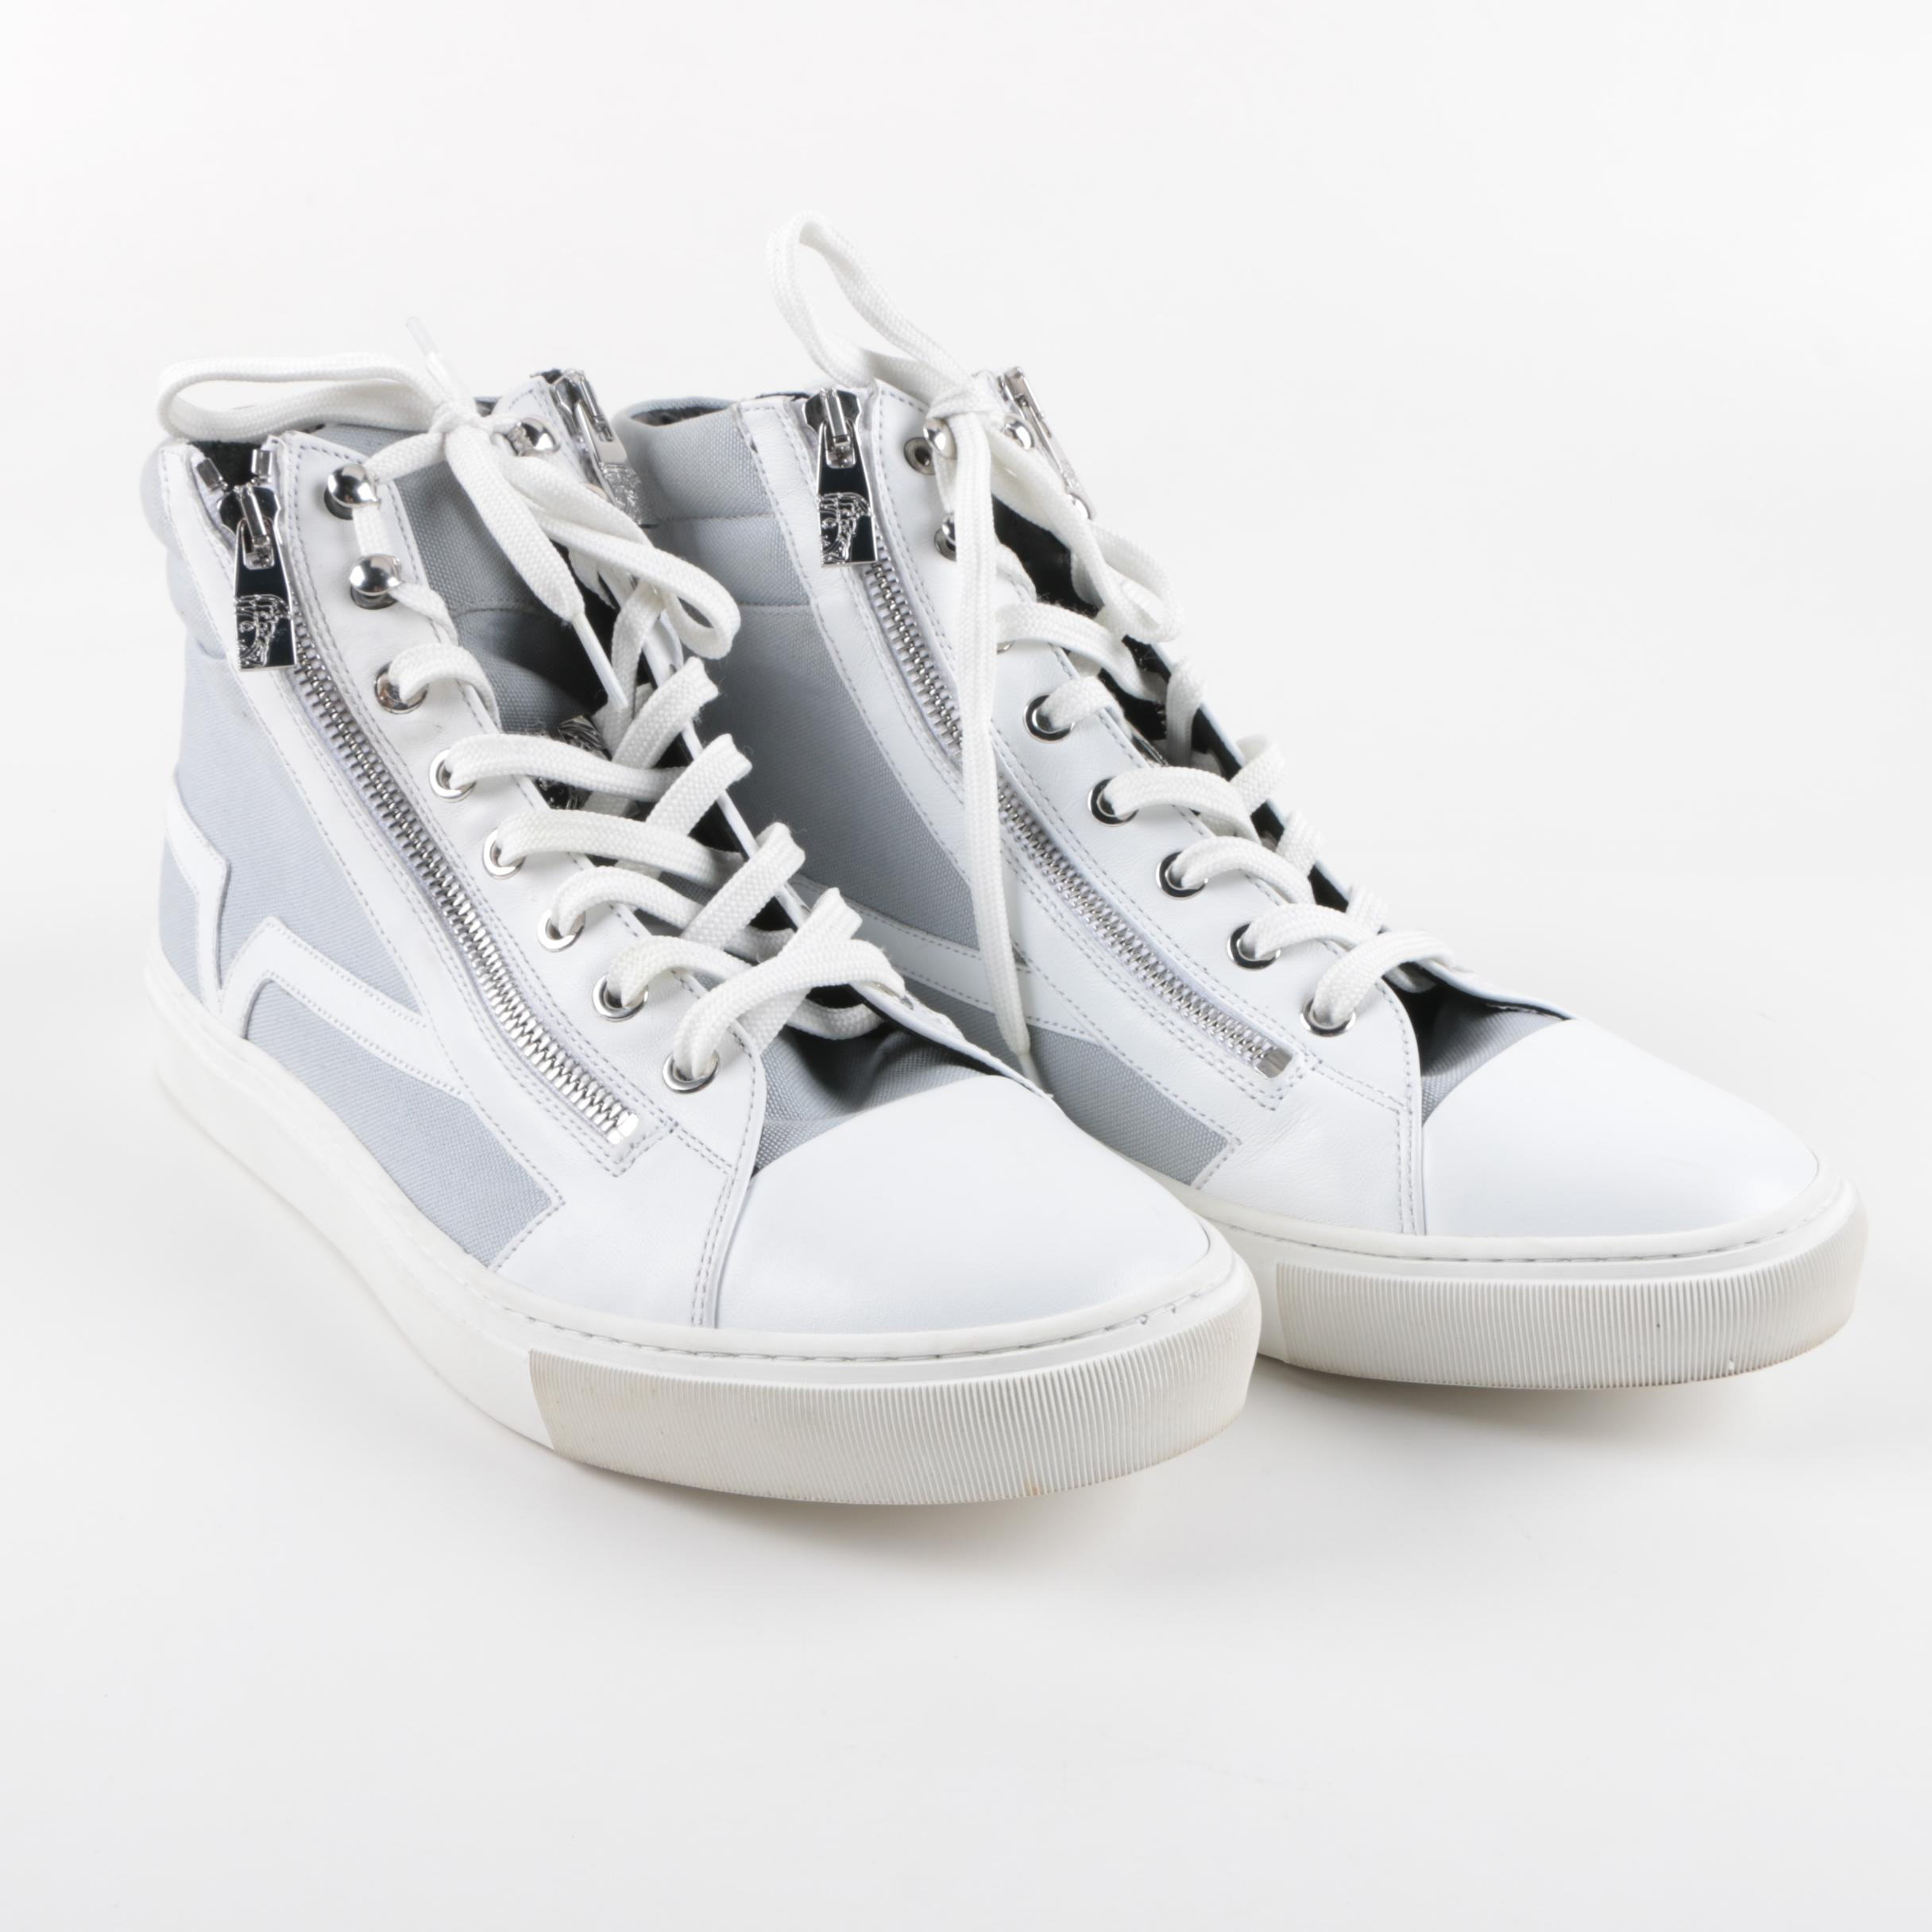 Men's Versace Collection High Top Sneakers